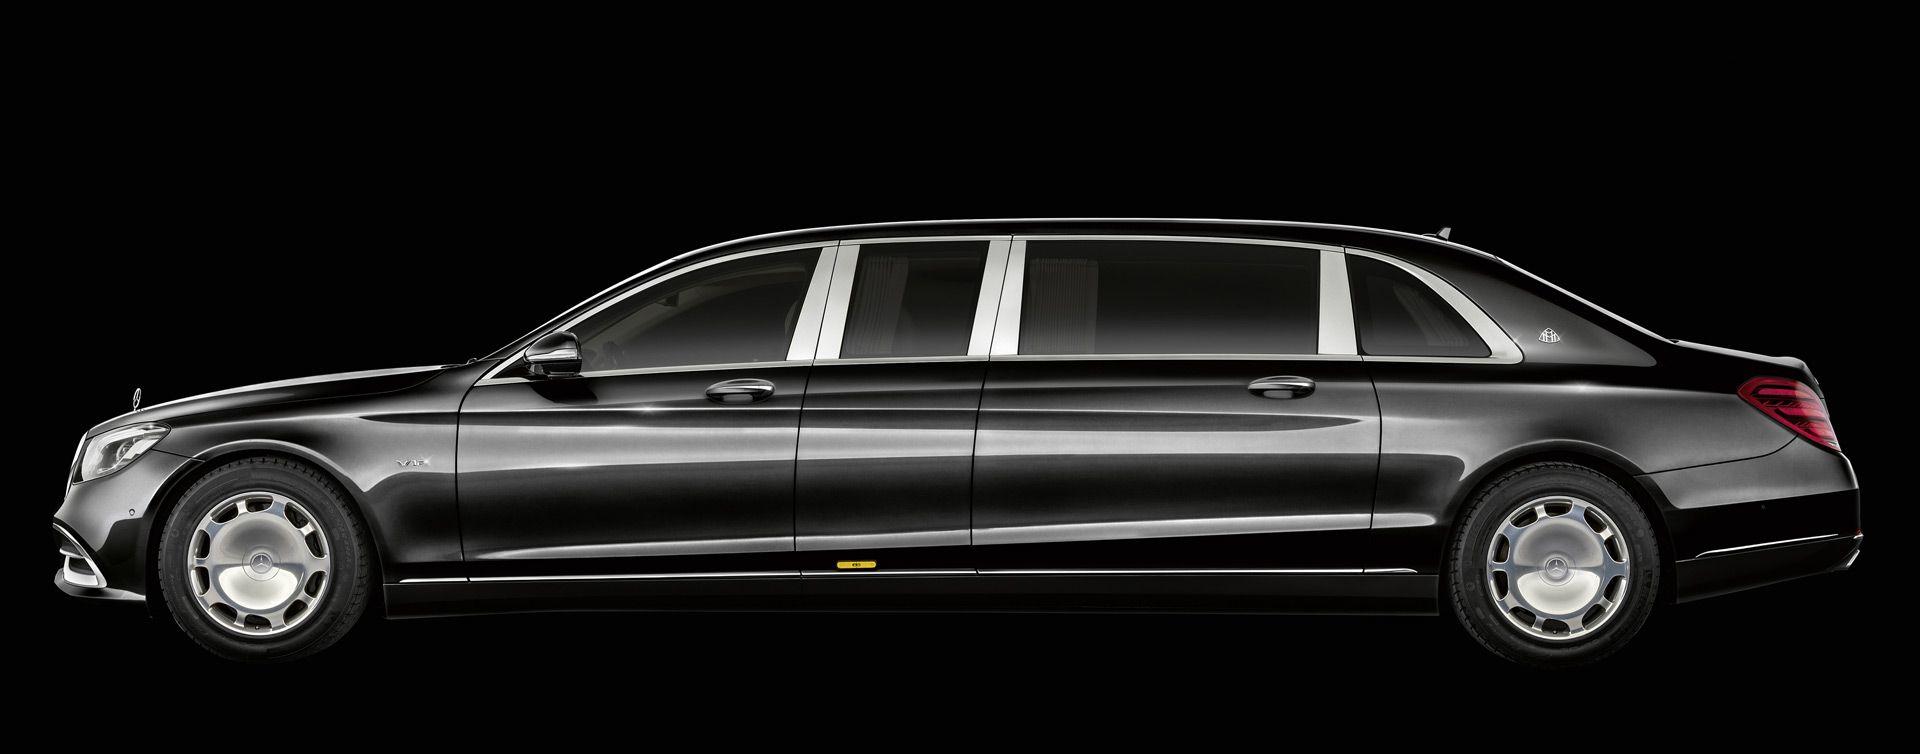 2019 Mercedes Benz Maybach S650 W222 Pullman Guard Limousine